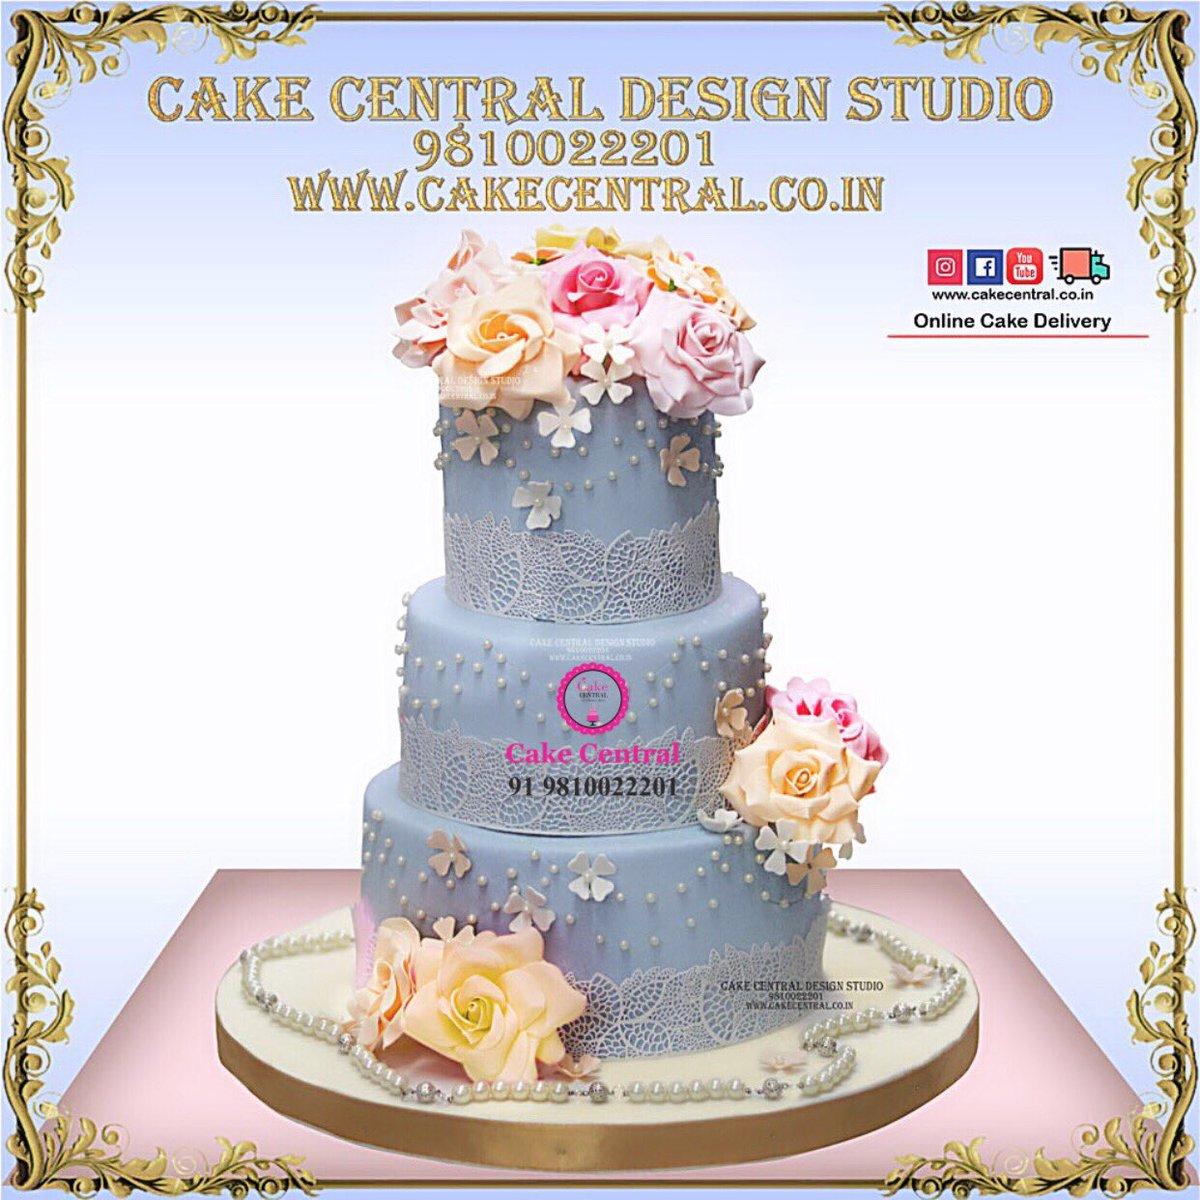 Central design studio twitter